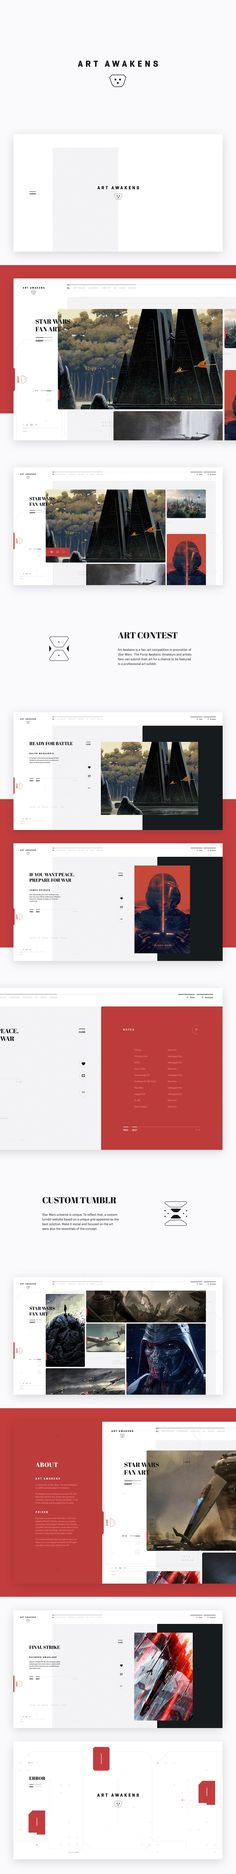 Star Wars Episode VII Tumblr Site | Abduzeedo Design Inspiration